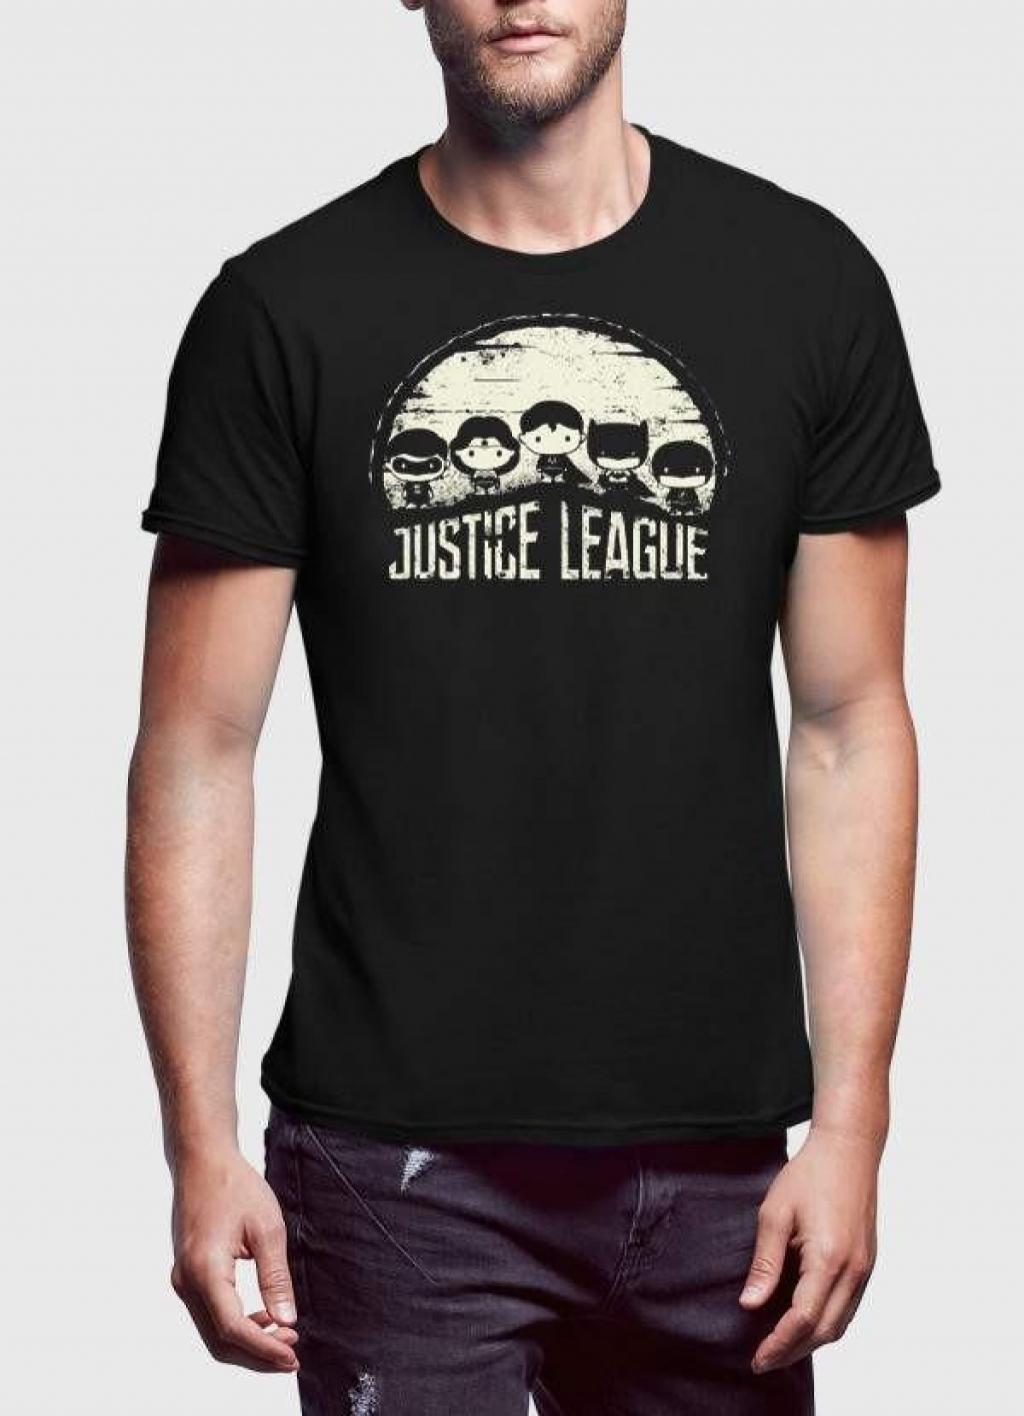 14991789250_Affordable_JUSTICE_LEAGUE-black_(1).jpg